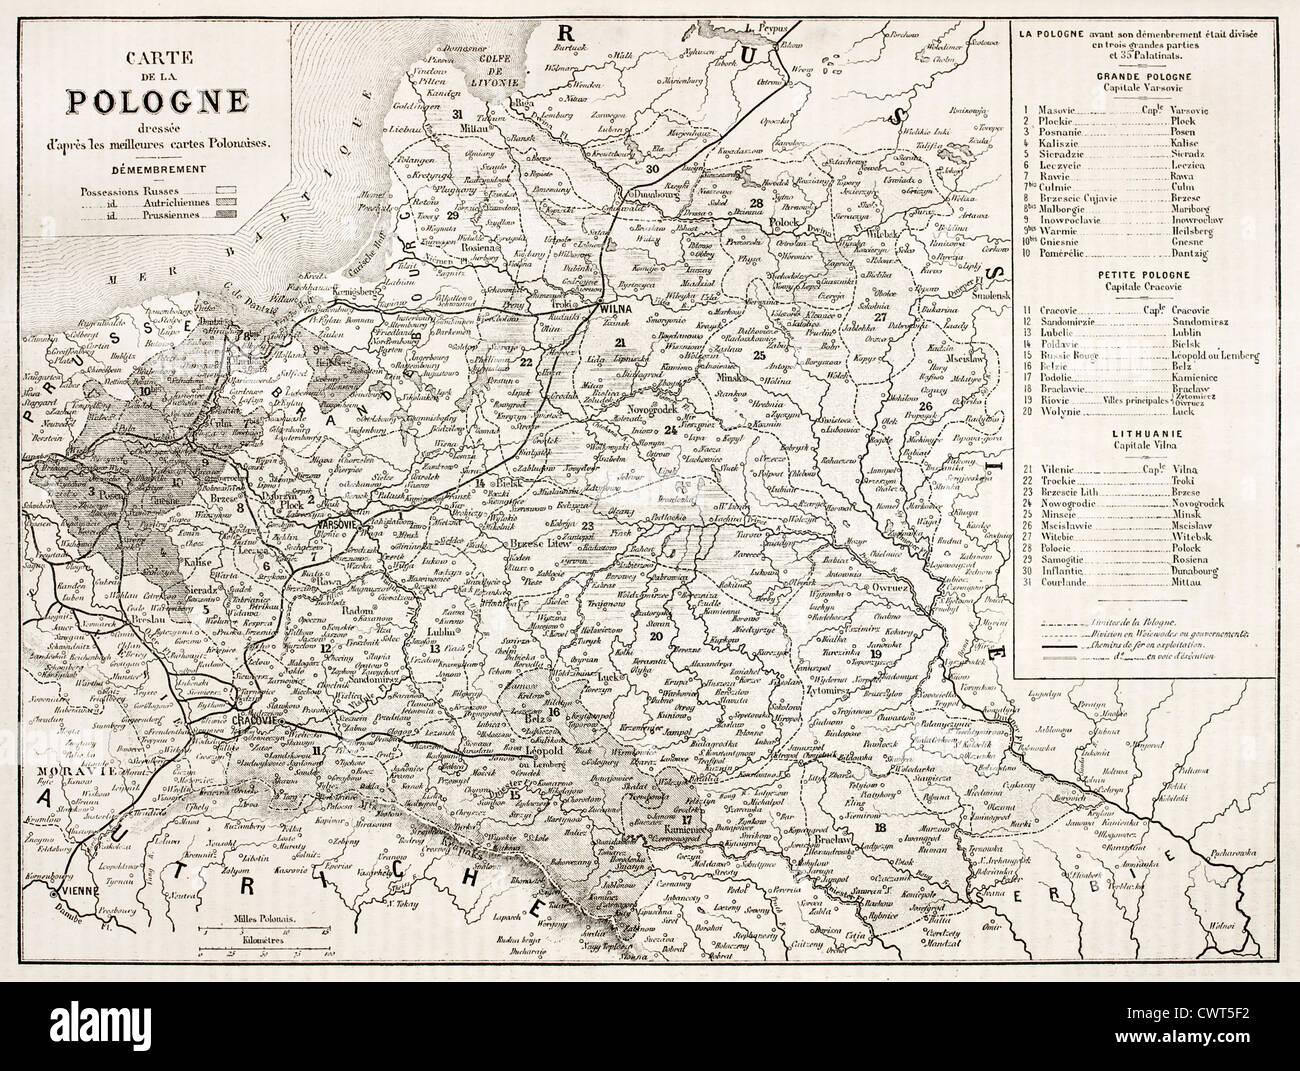 Polen Karte.Alte Karte Von Polen Stockfoto Bild 50318326 Alamy